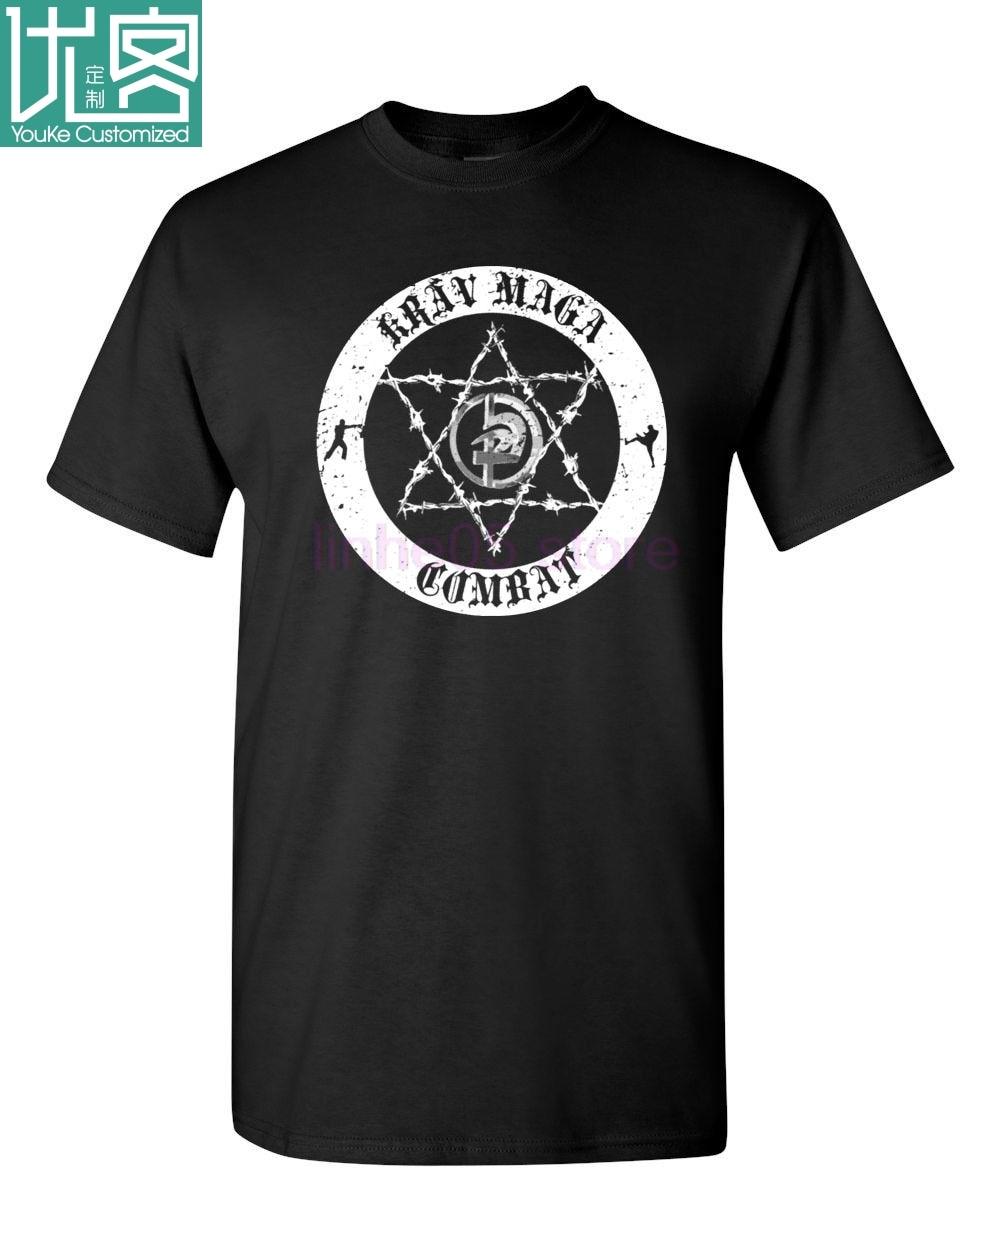 LEQEMAO Krav Maga Combat CIRCLE IDF Defensa de Israel Martialer Artser hombres camiseta Camiseta cuello redondo moda Casual imprimir camiseta